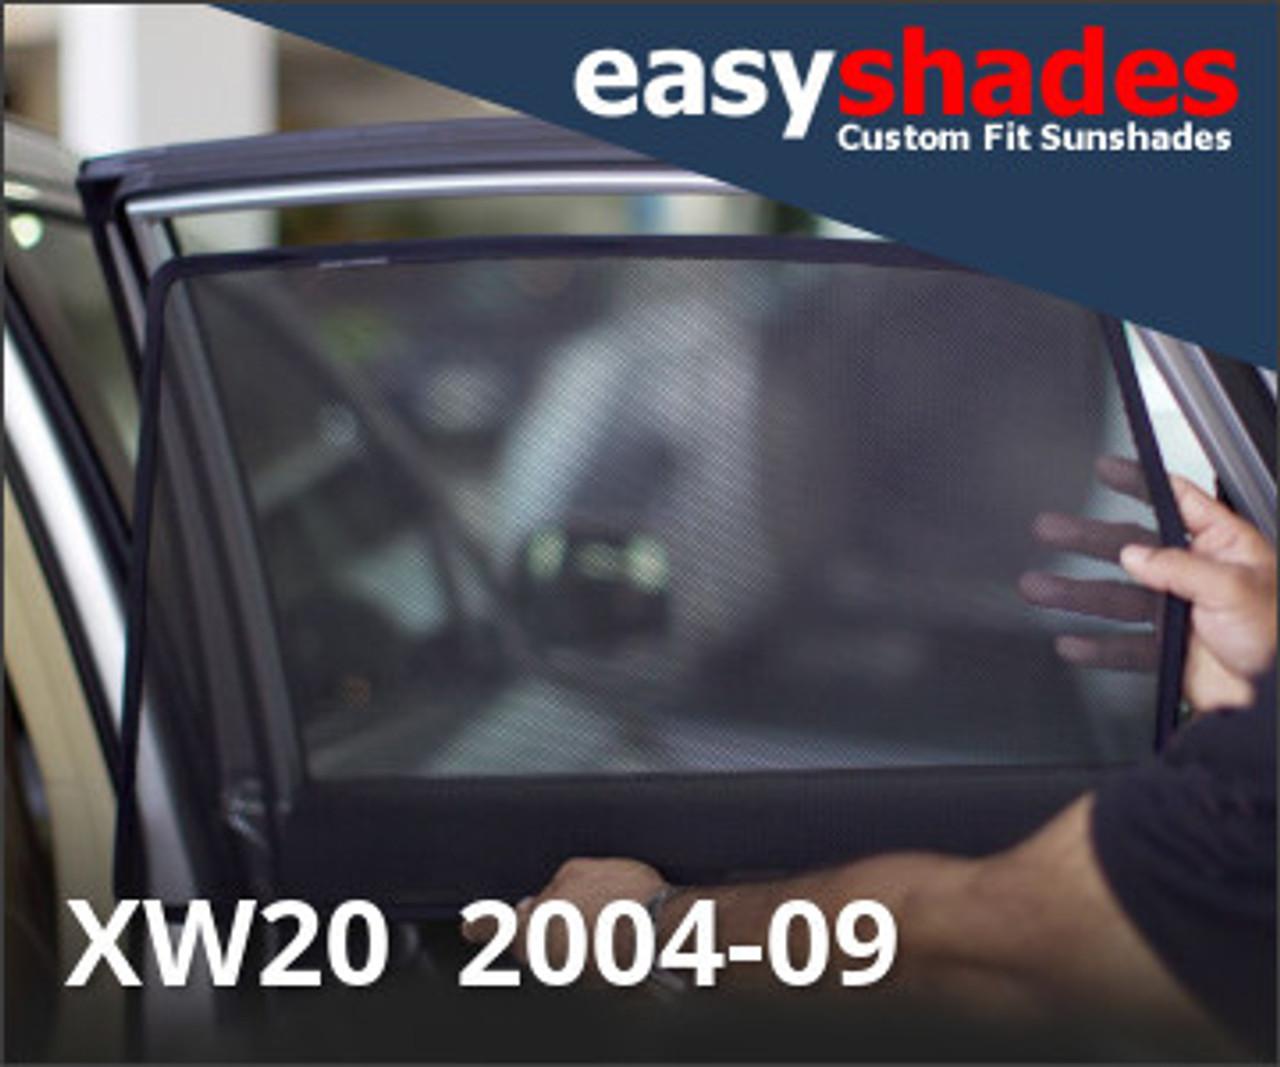 XW20 2004-09